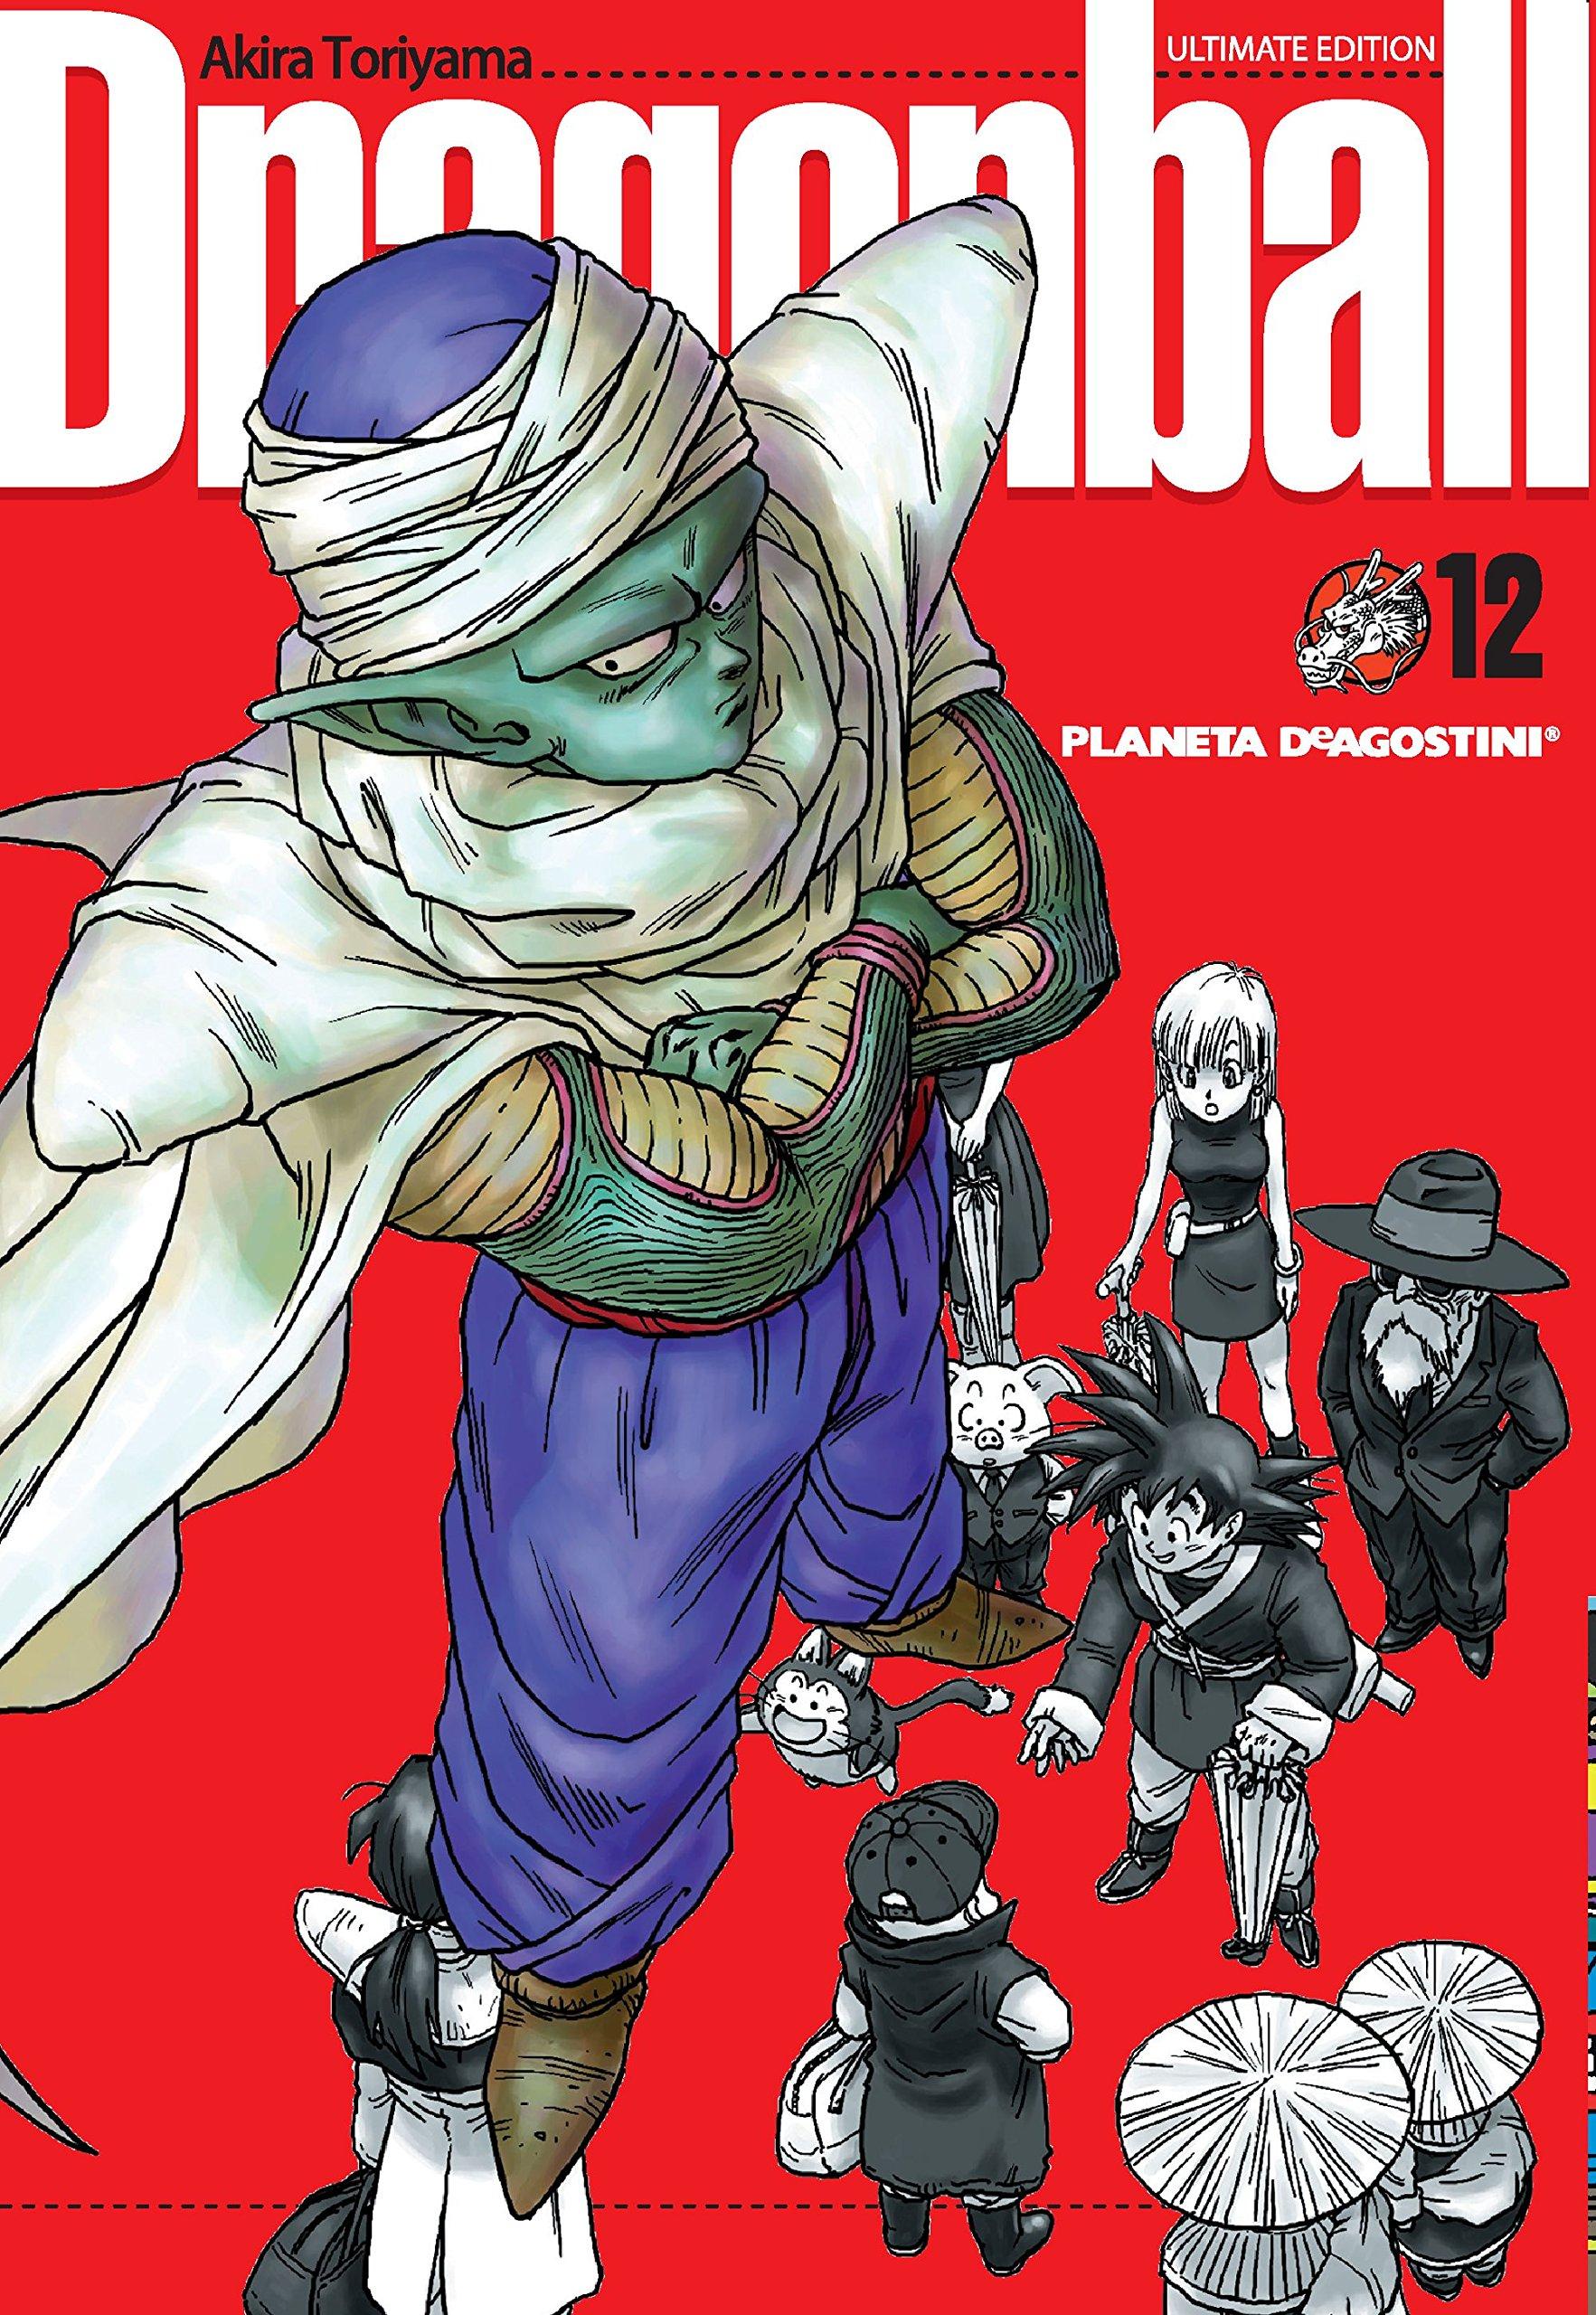 Dragon Ball nº 12/34 (Manga Shonen) Tapa blanda – 13 feb 2008 Akira Toriyama Planeta DeAgostini Cómics 8468470457 Graphic novels: Manga